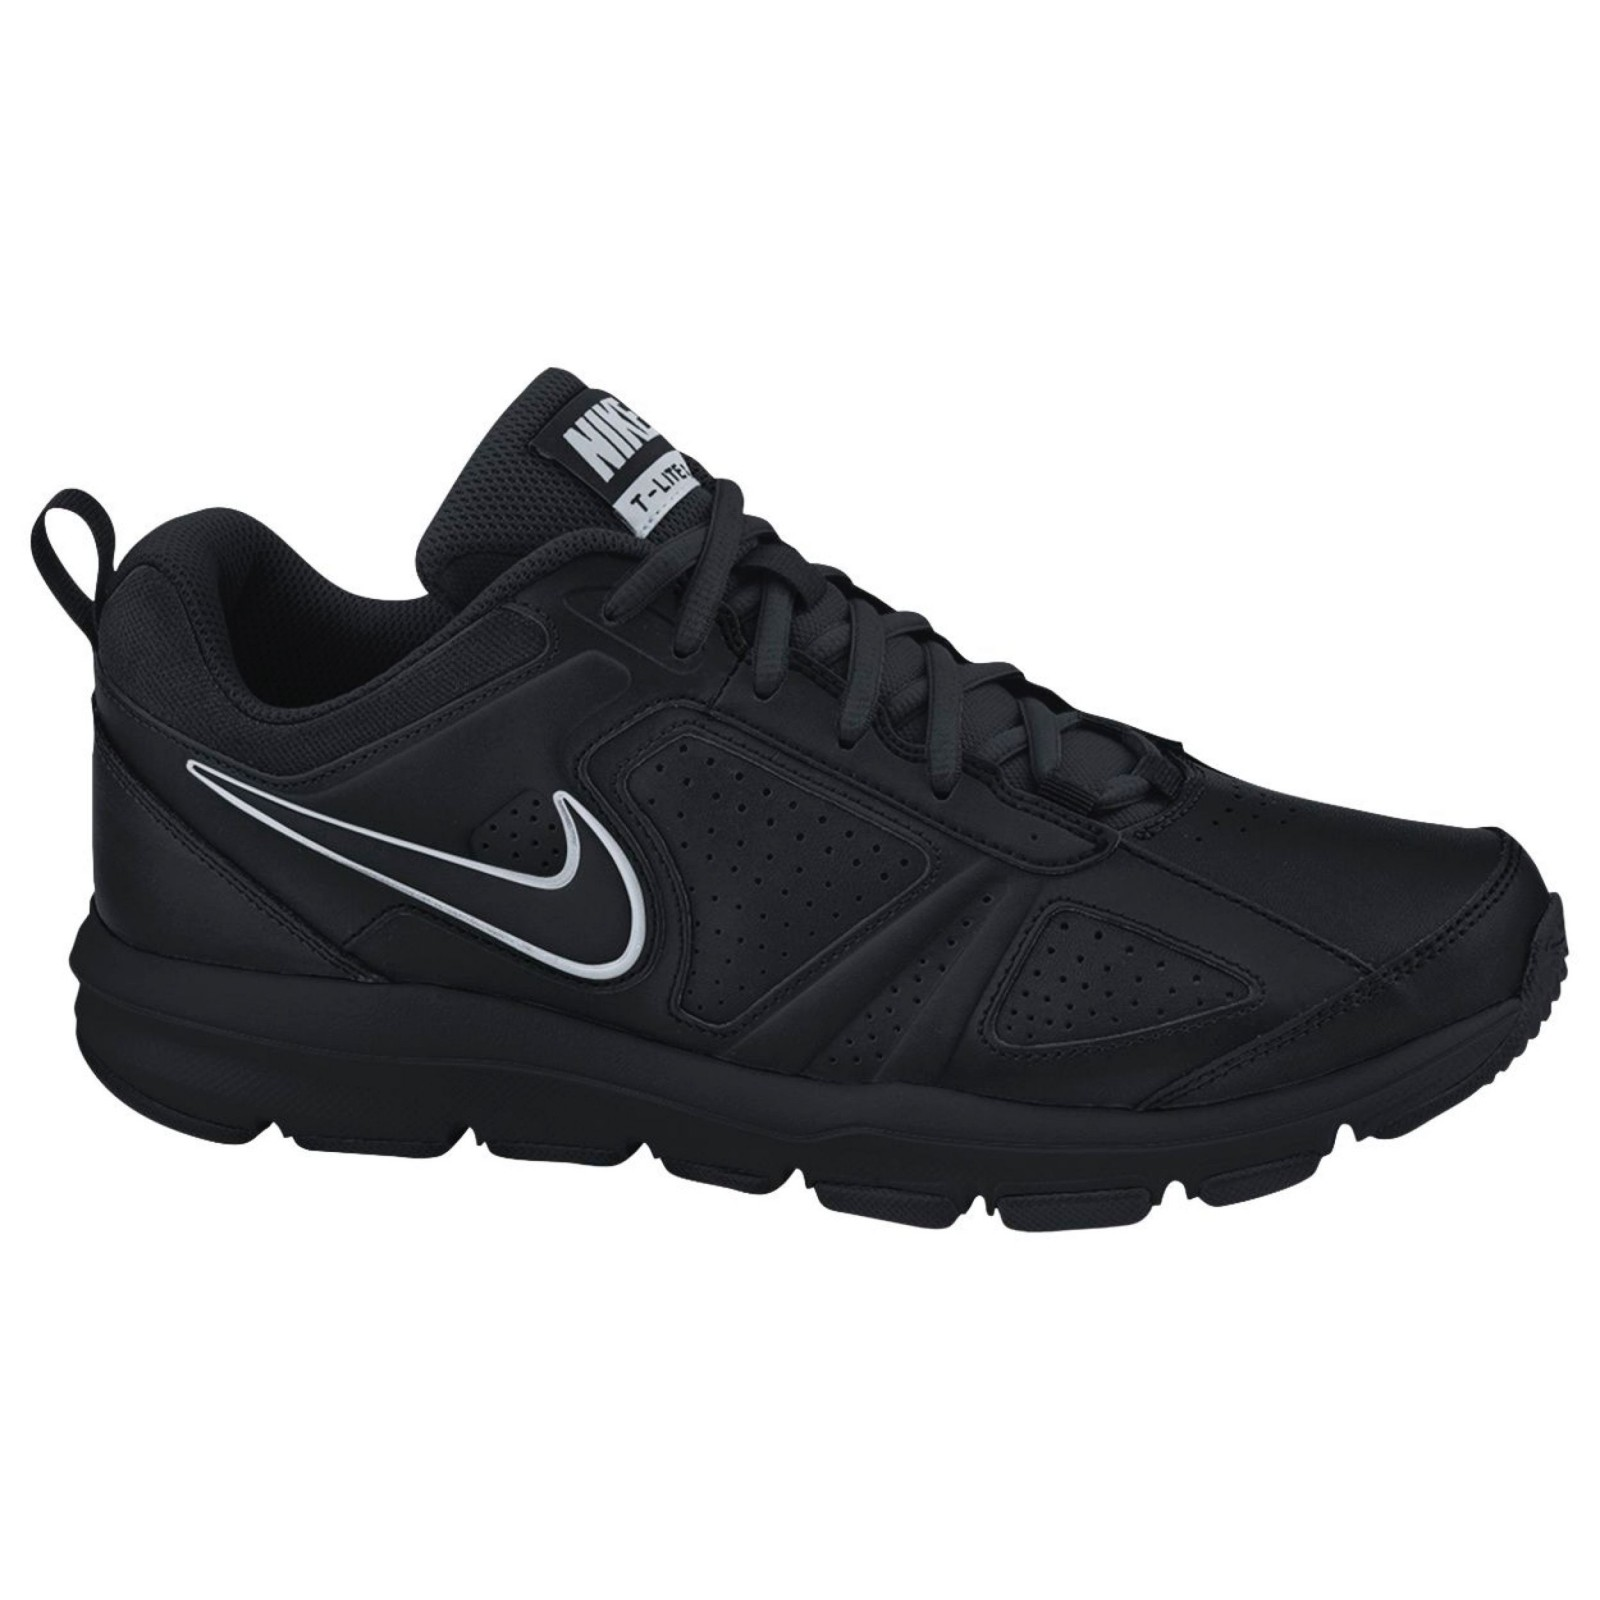 Pánská fitness obuv Nike T-LITE XI  74dbaace0ab